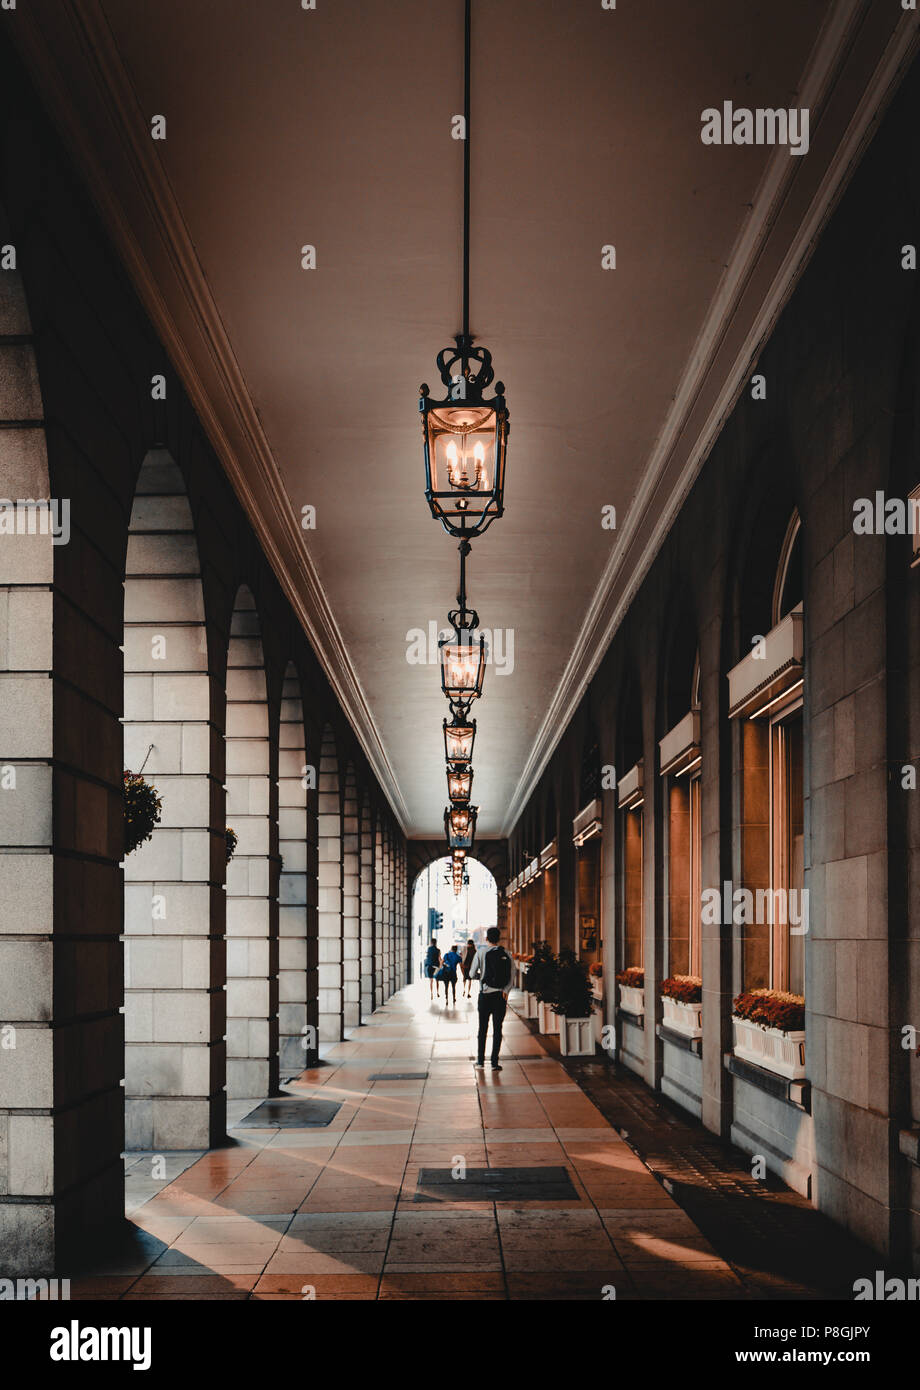 London city centre - Stock Image